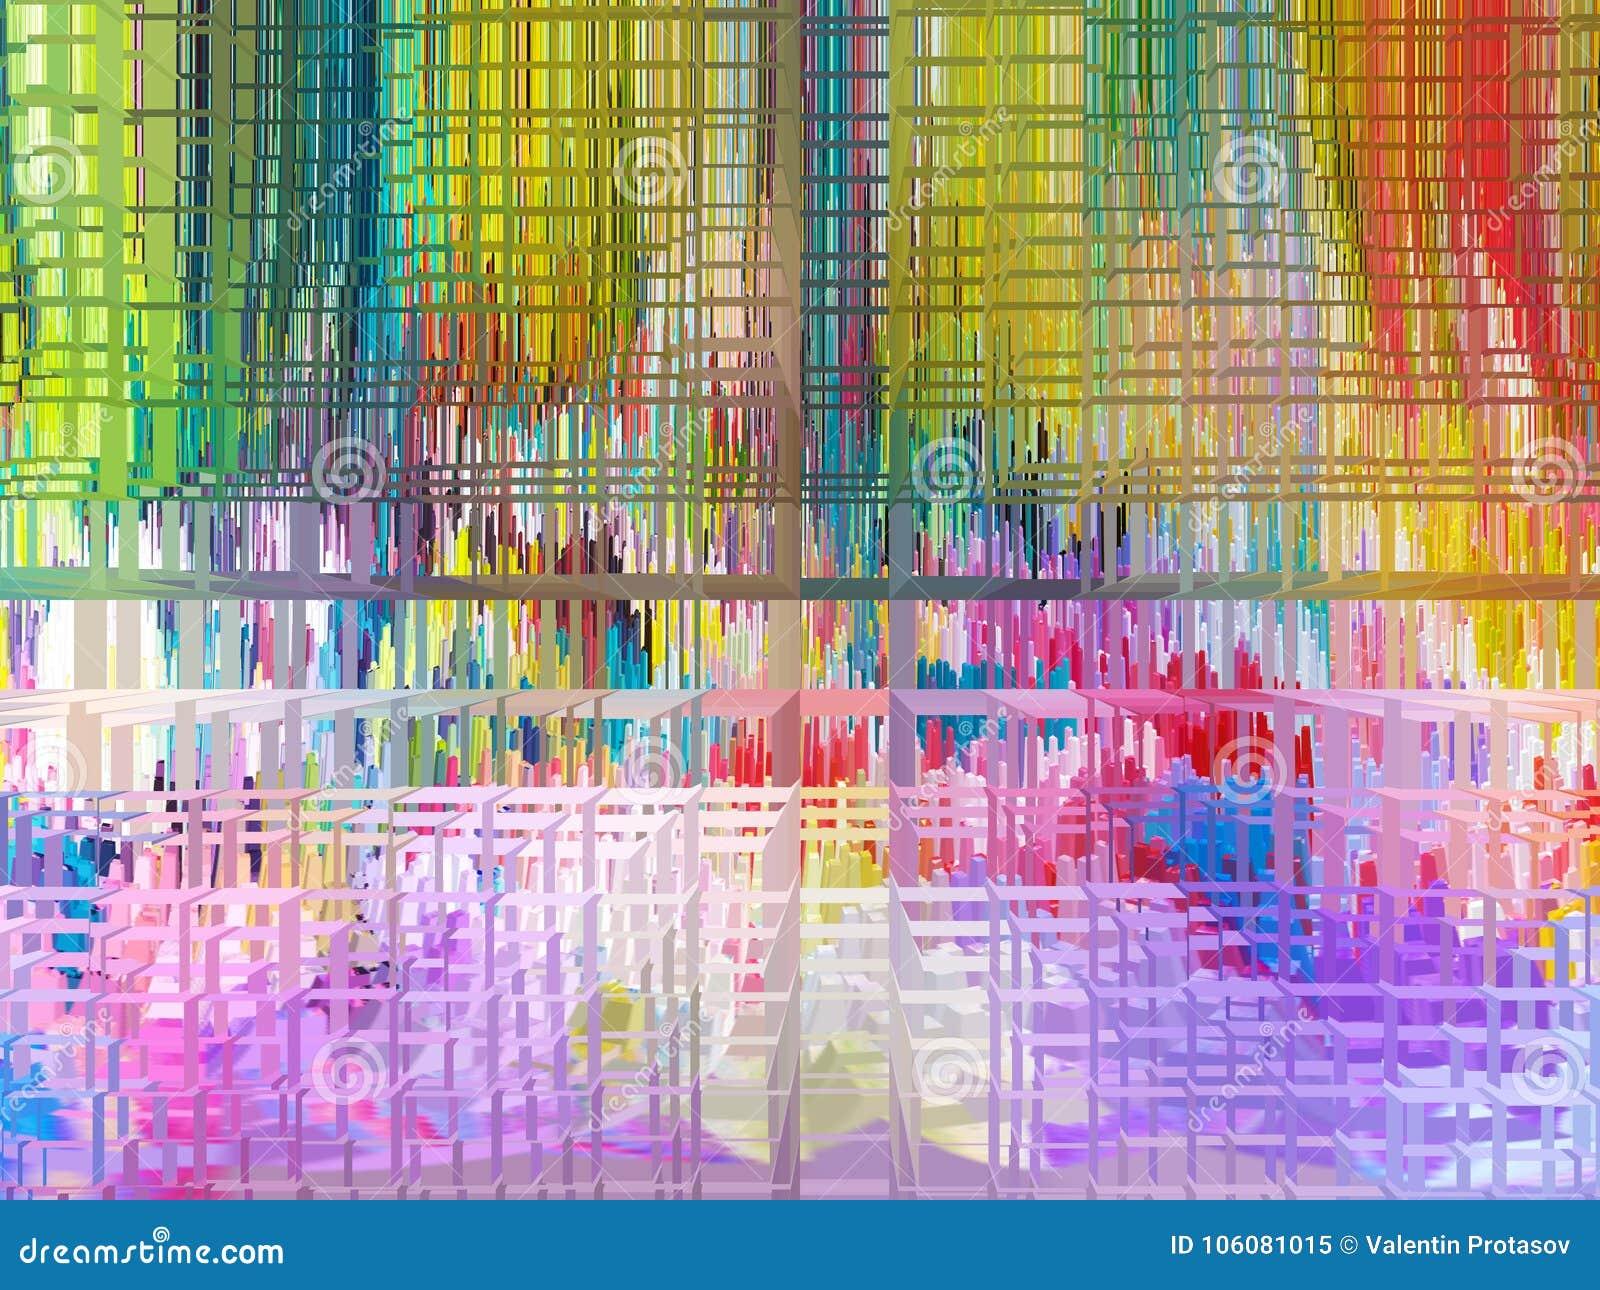 Abstractie Samenvatting Textuur geweven uniciteit abstracties samenvattingen texturen